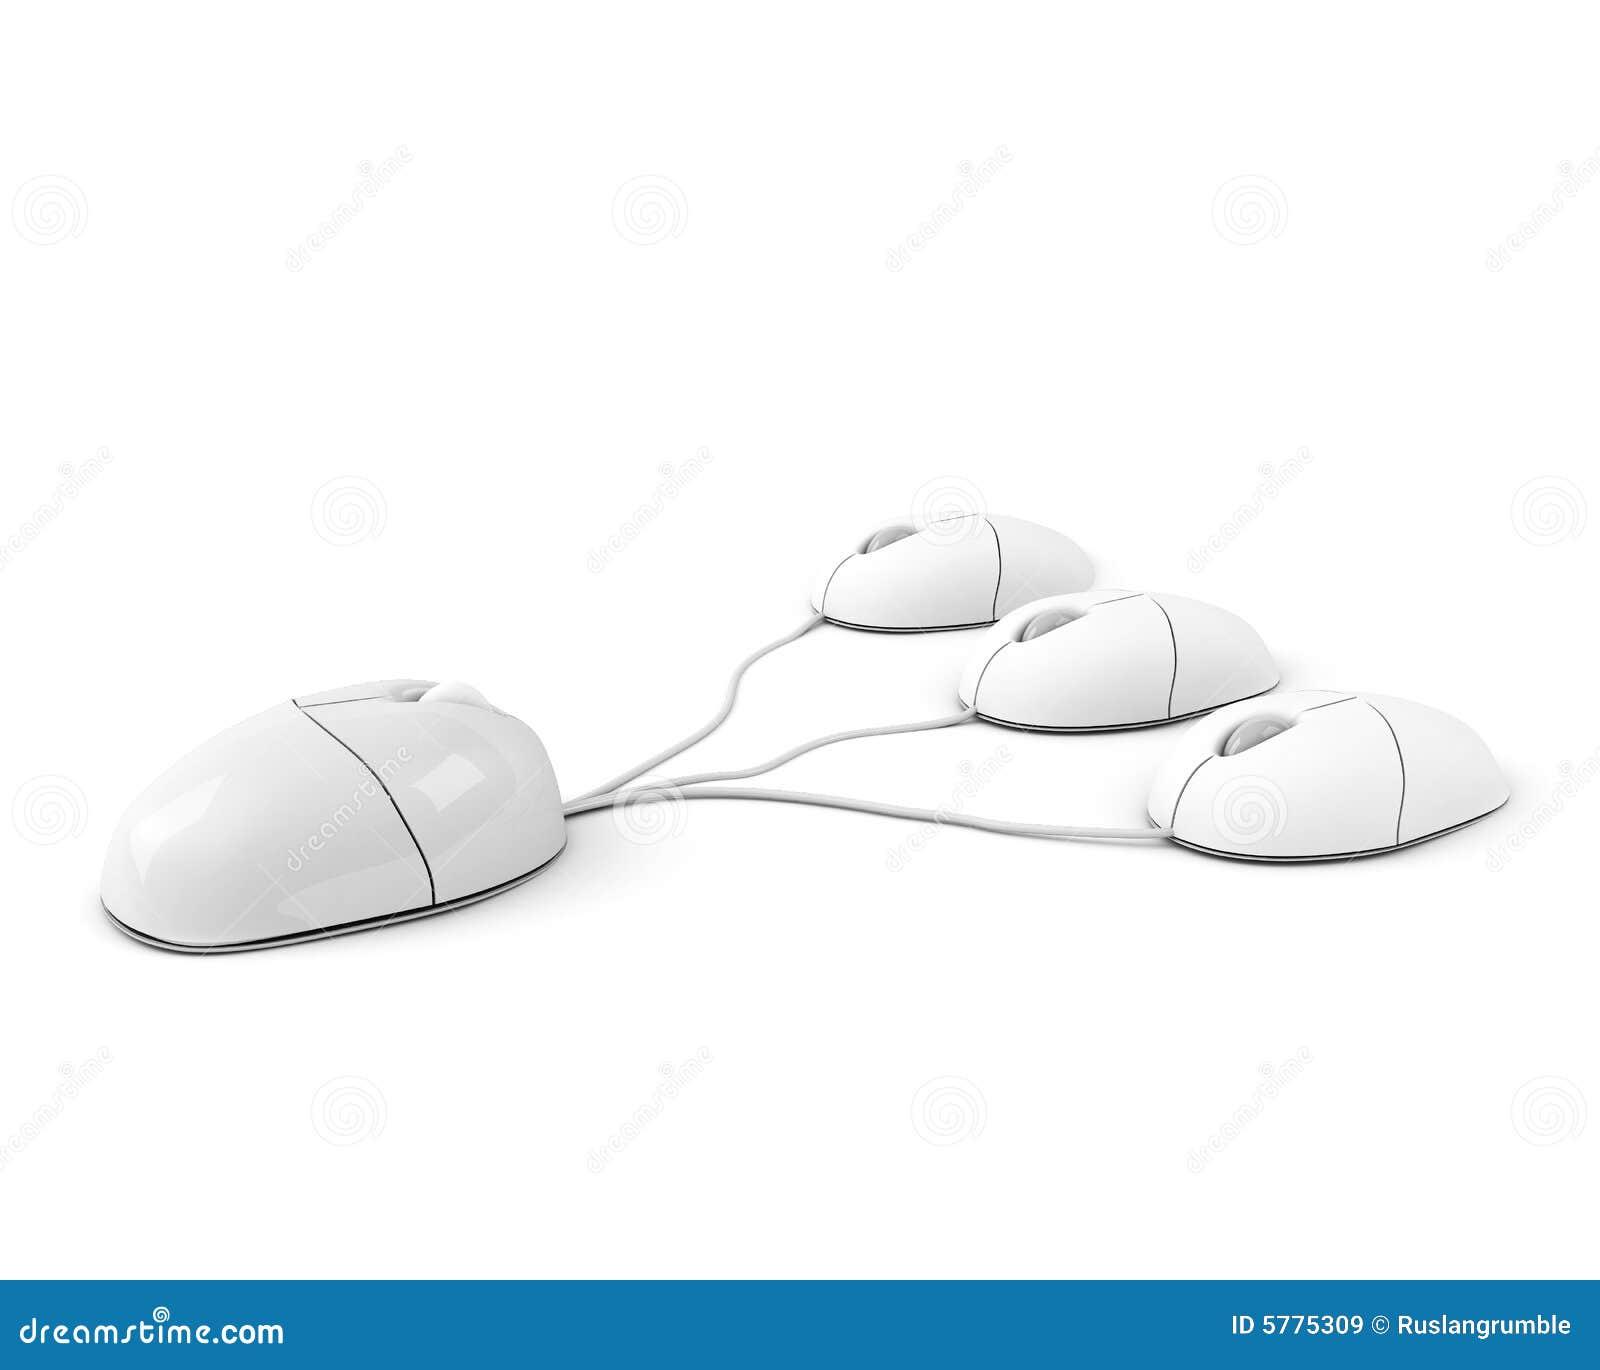 Big boss mouse leading its staff